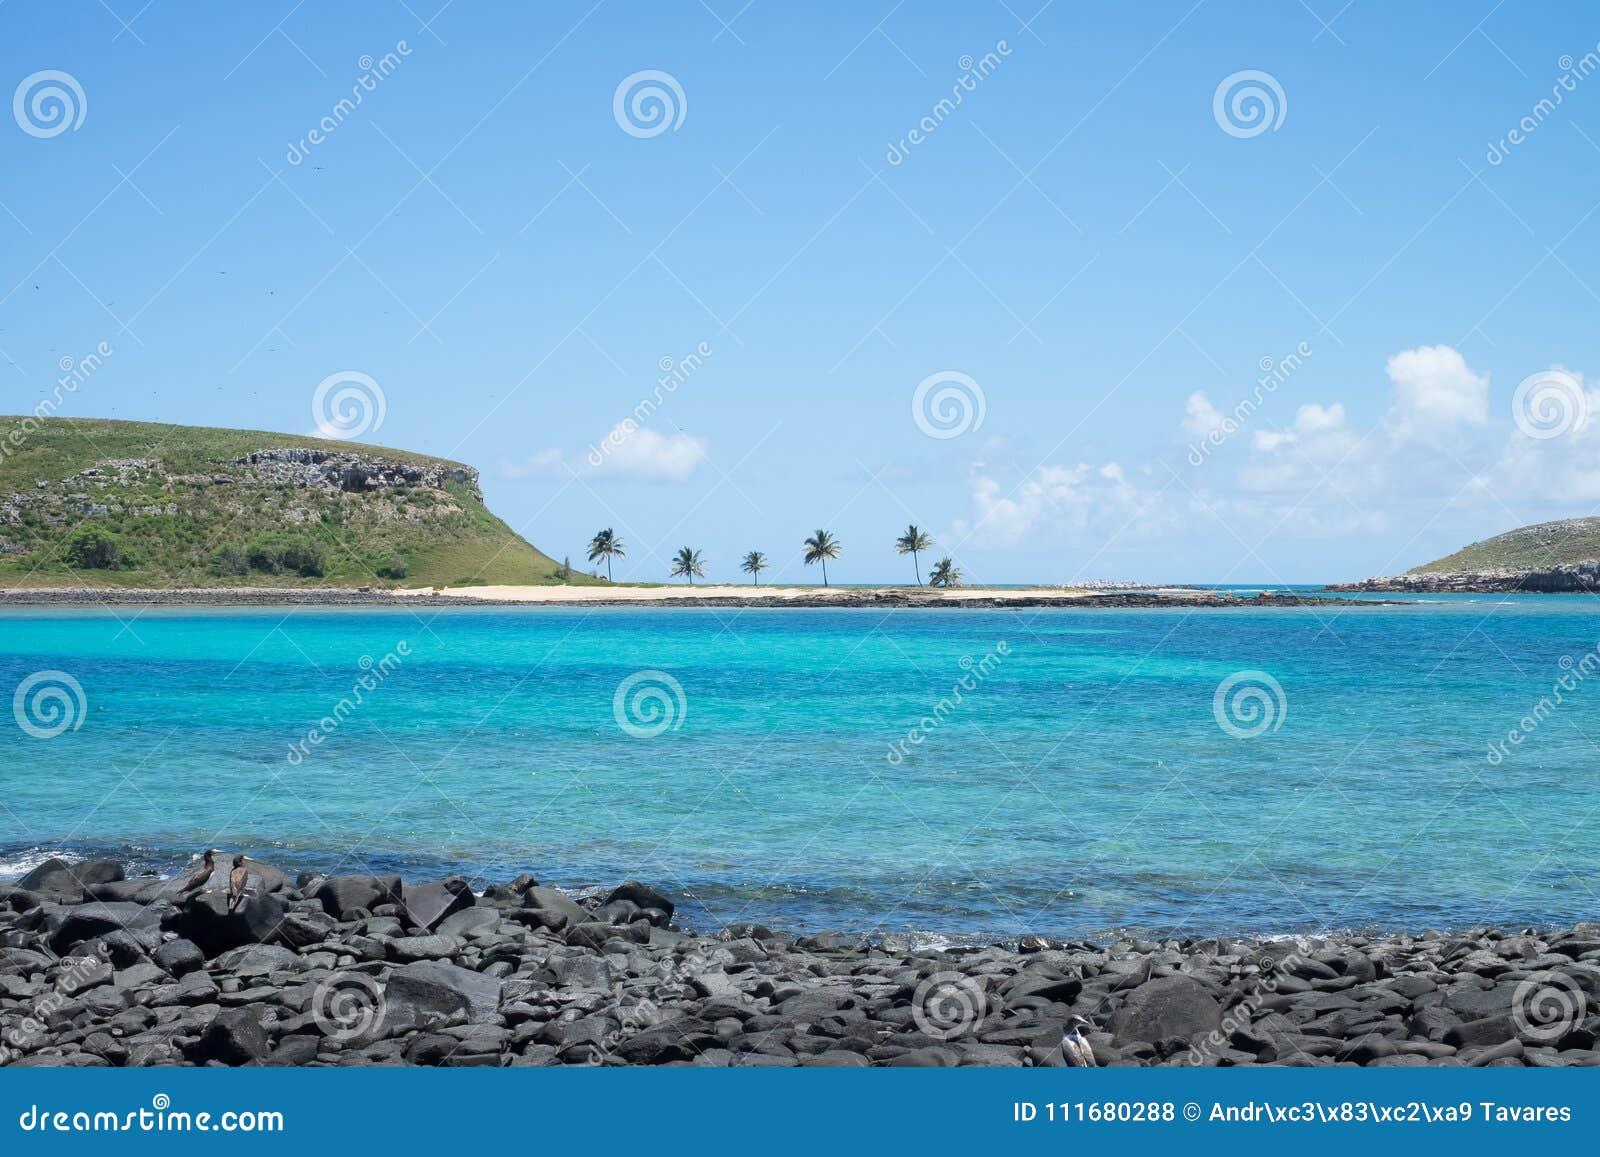 Abrolhos archipelago, south of Bahia, Brazil